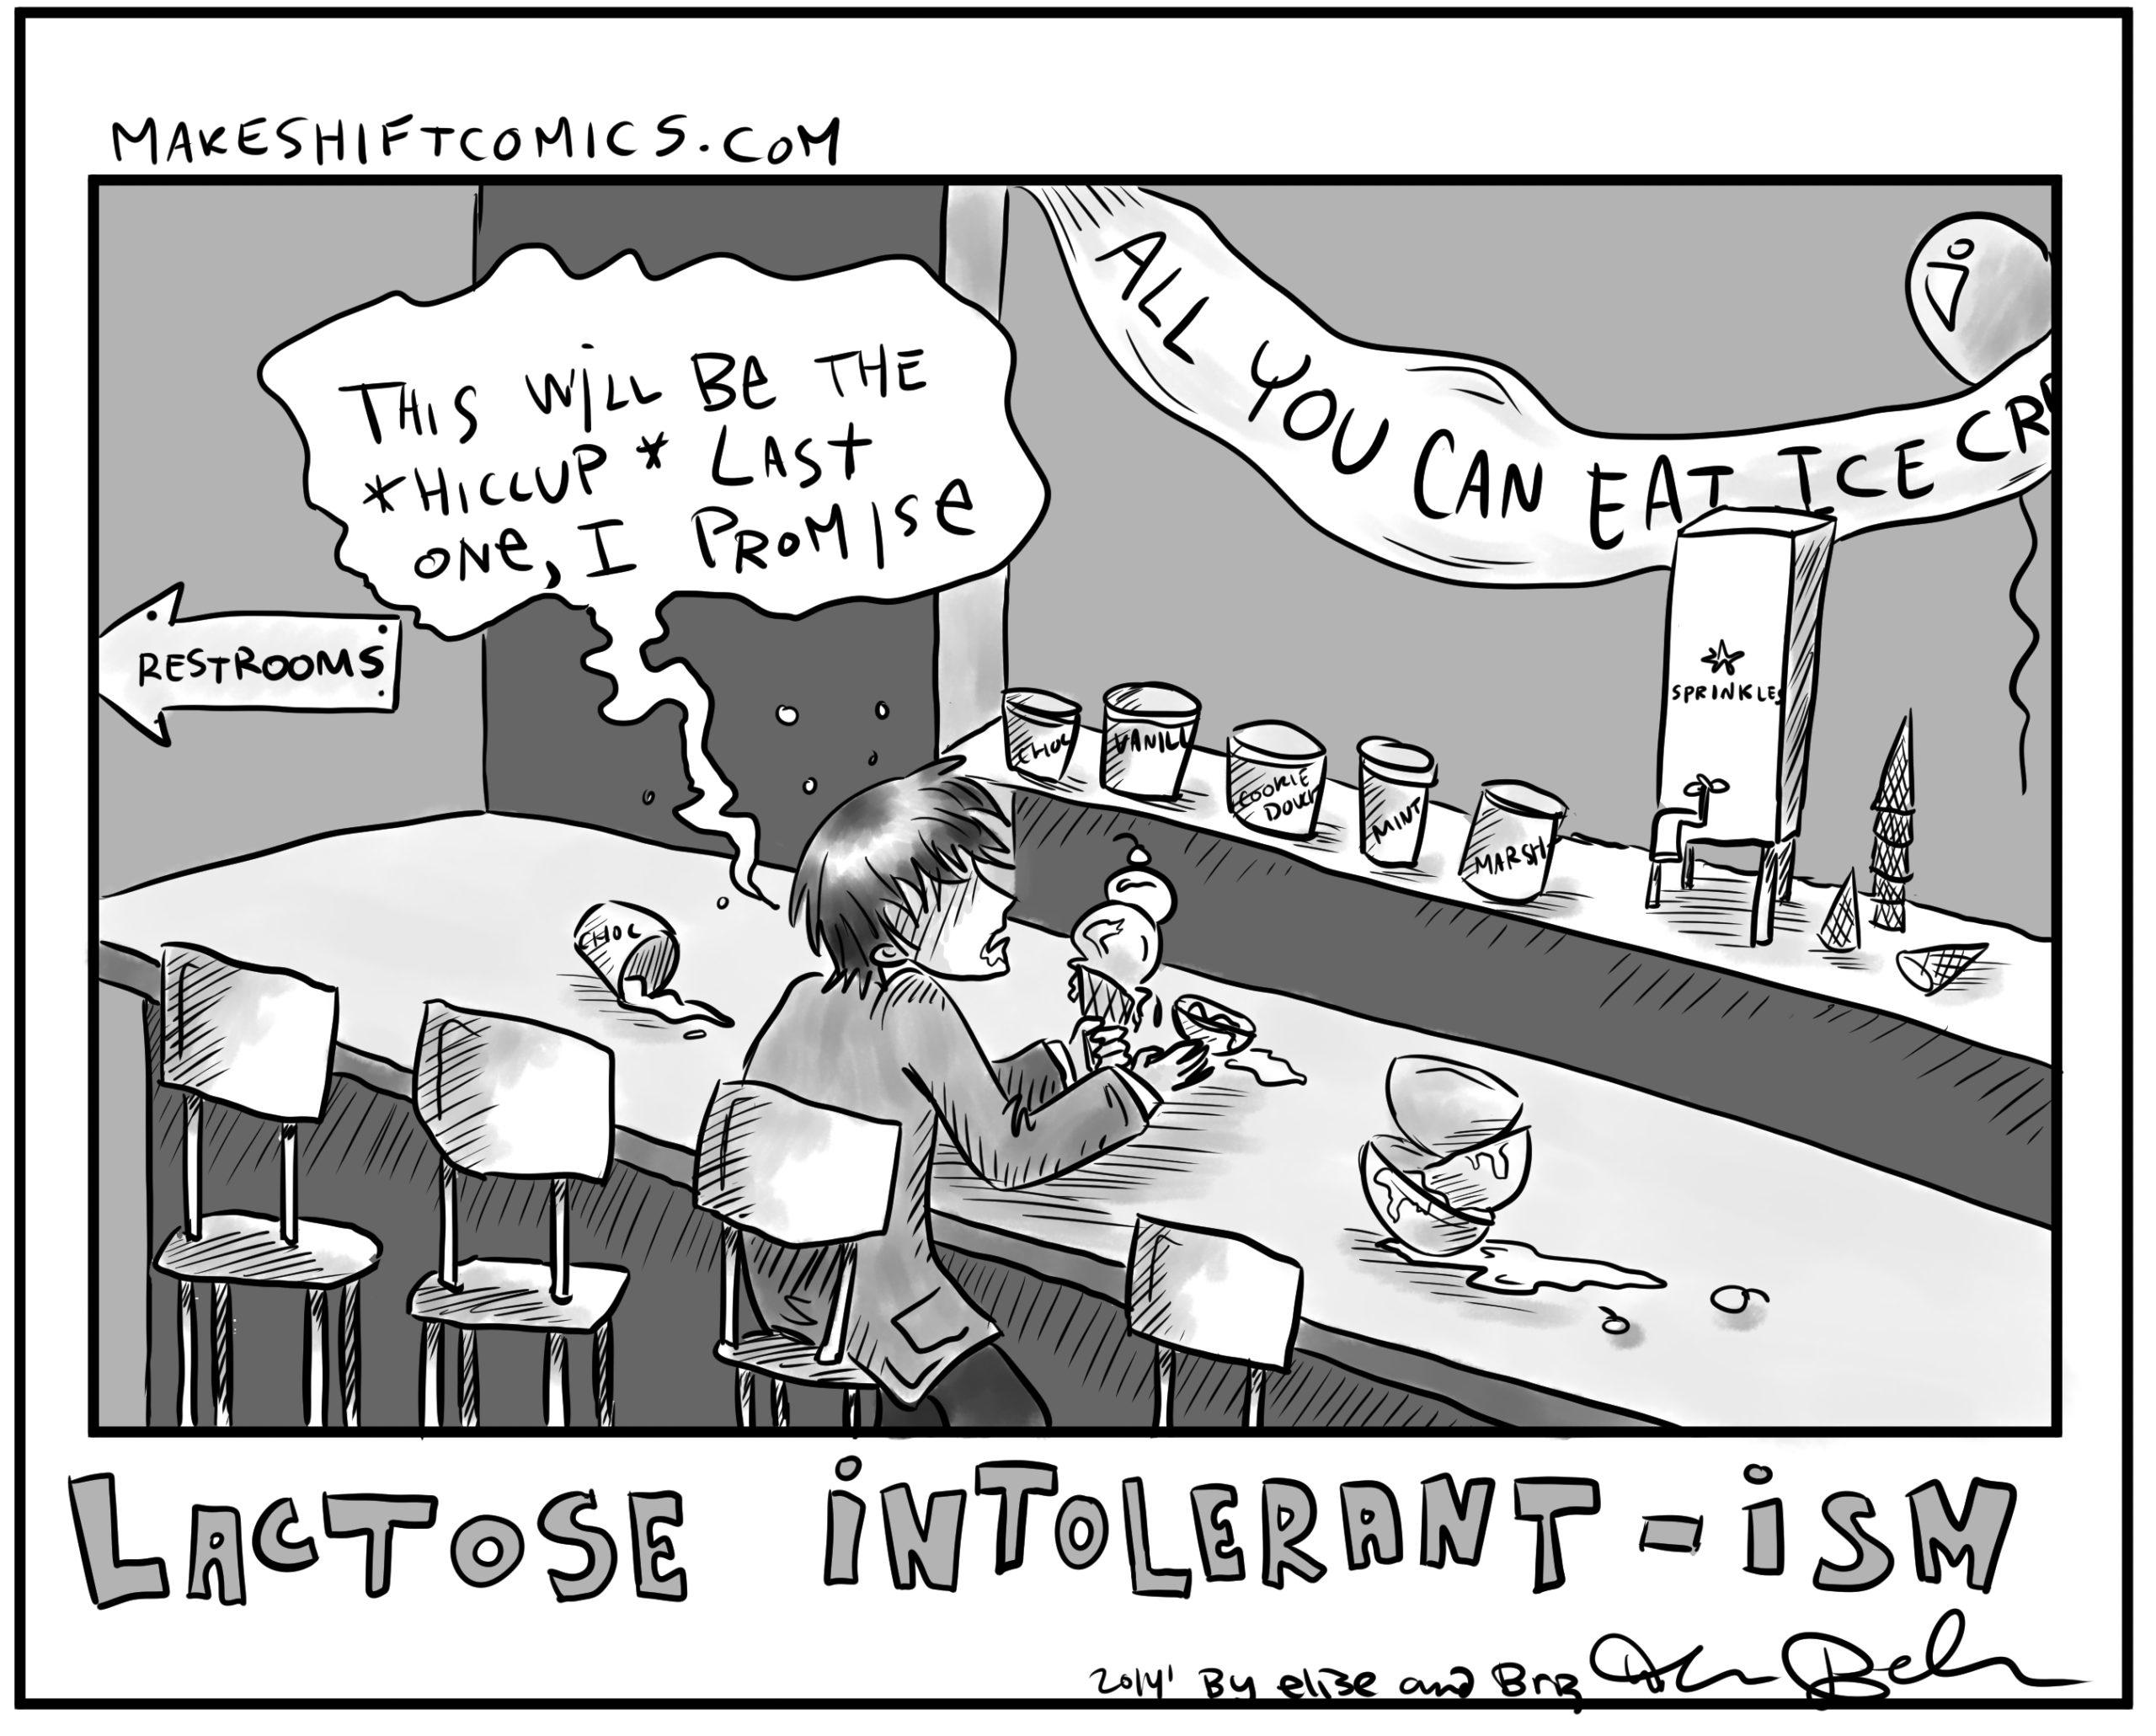 Lactose Intolerant-ism